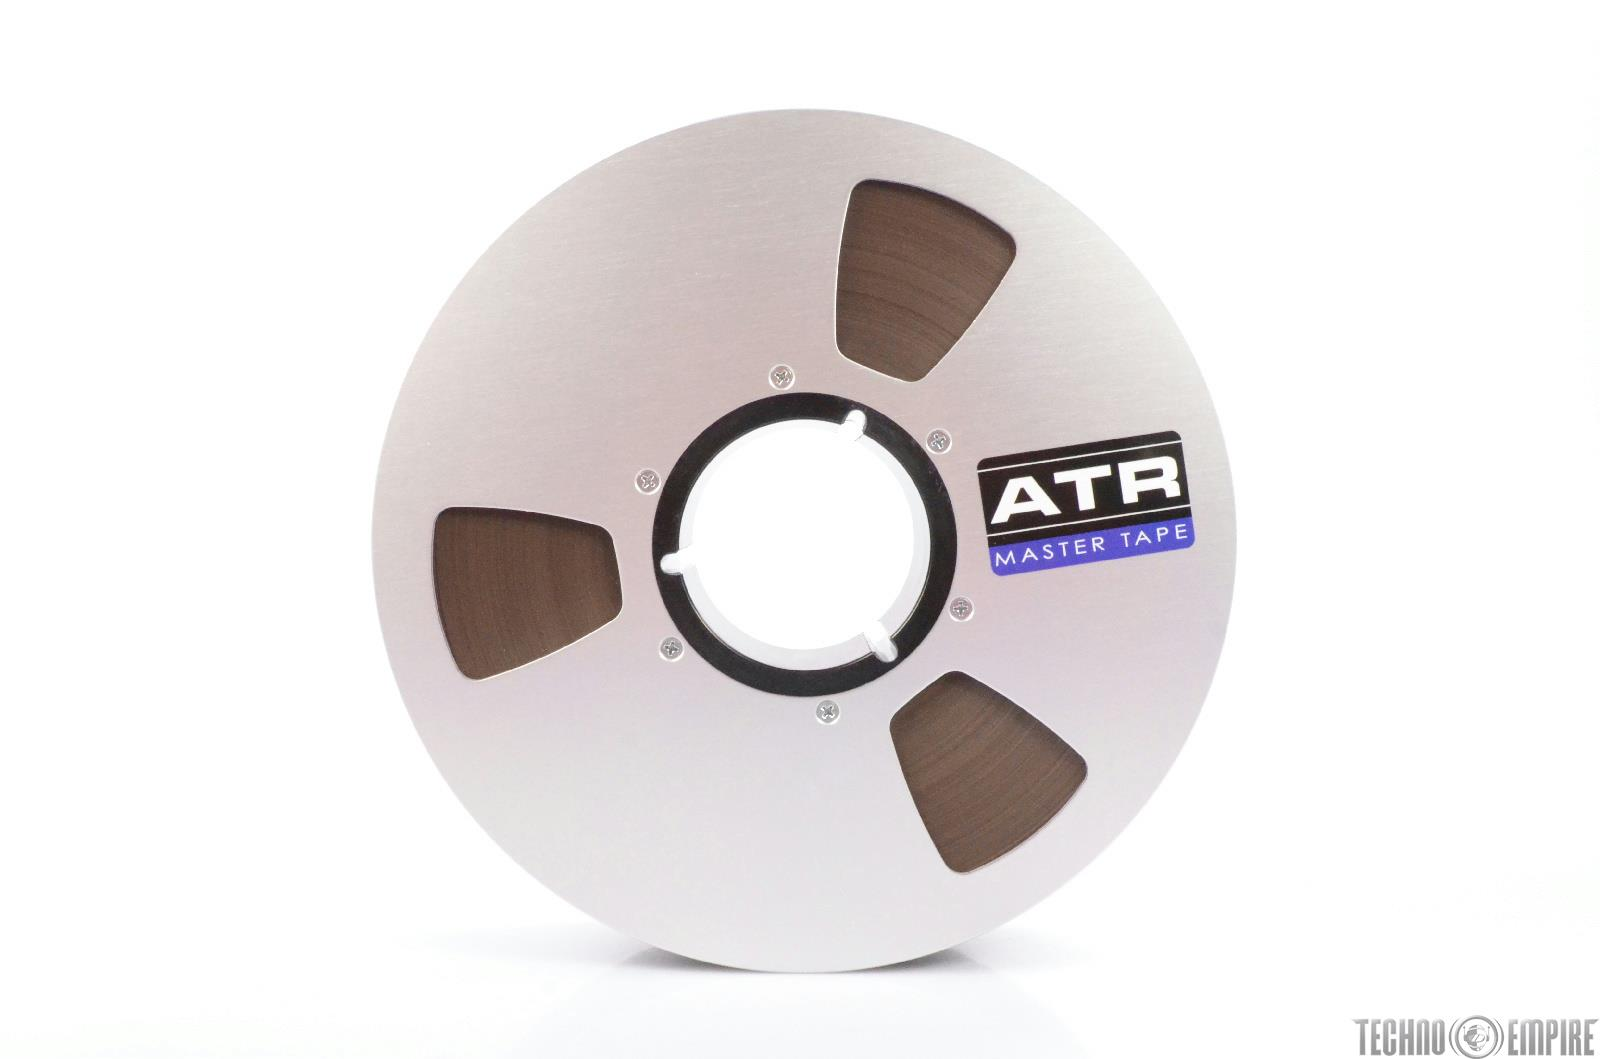 "ATR MAGNETICS Studio Master 2"" x 2500' 10.5"" Analog Reel Recording Tape #27559"